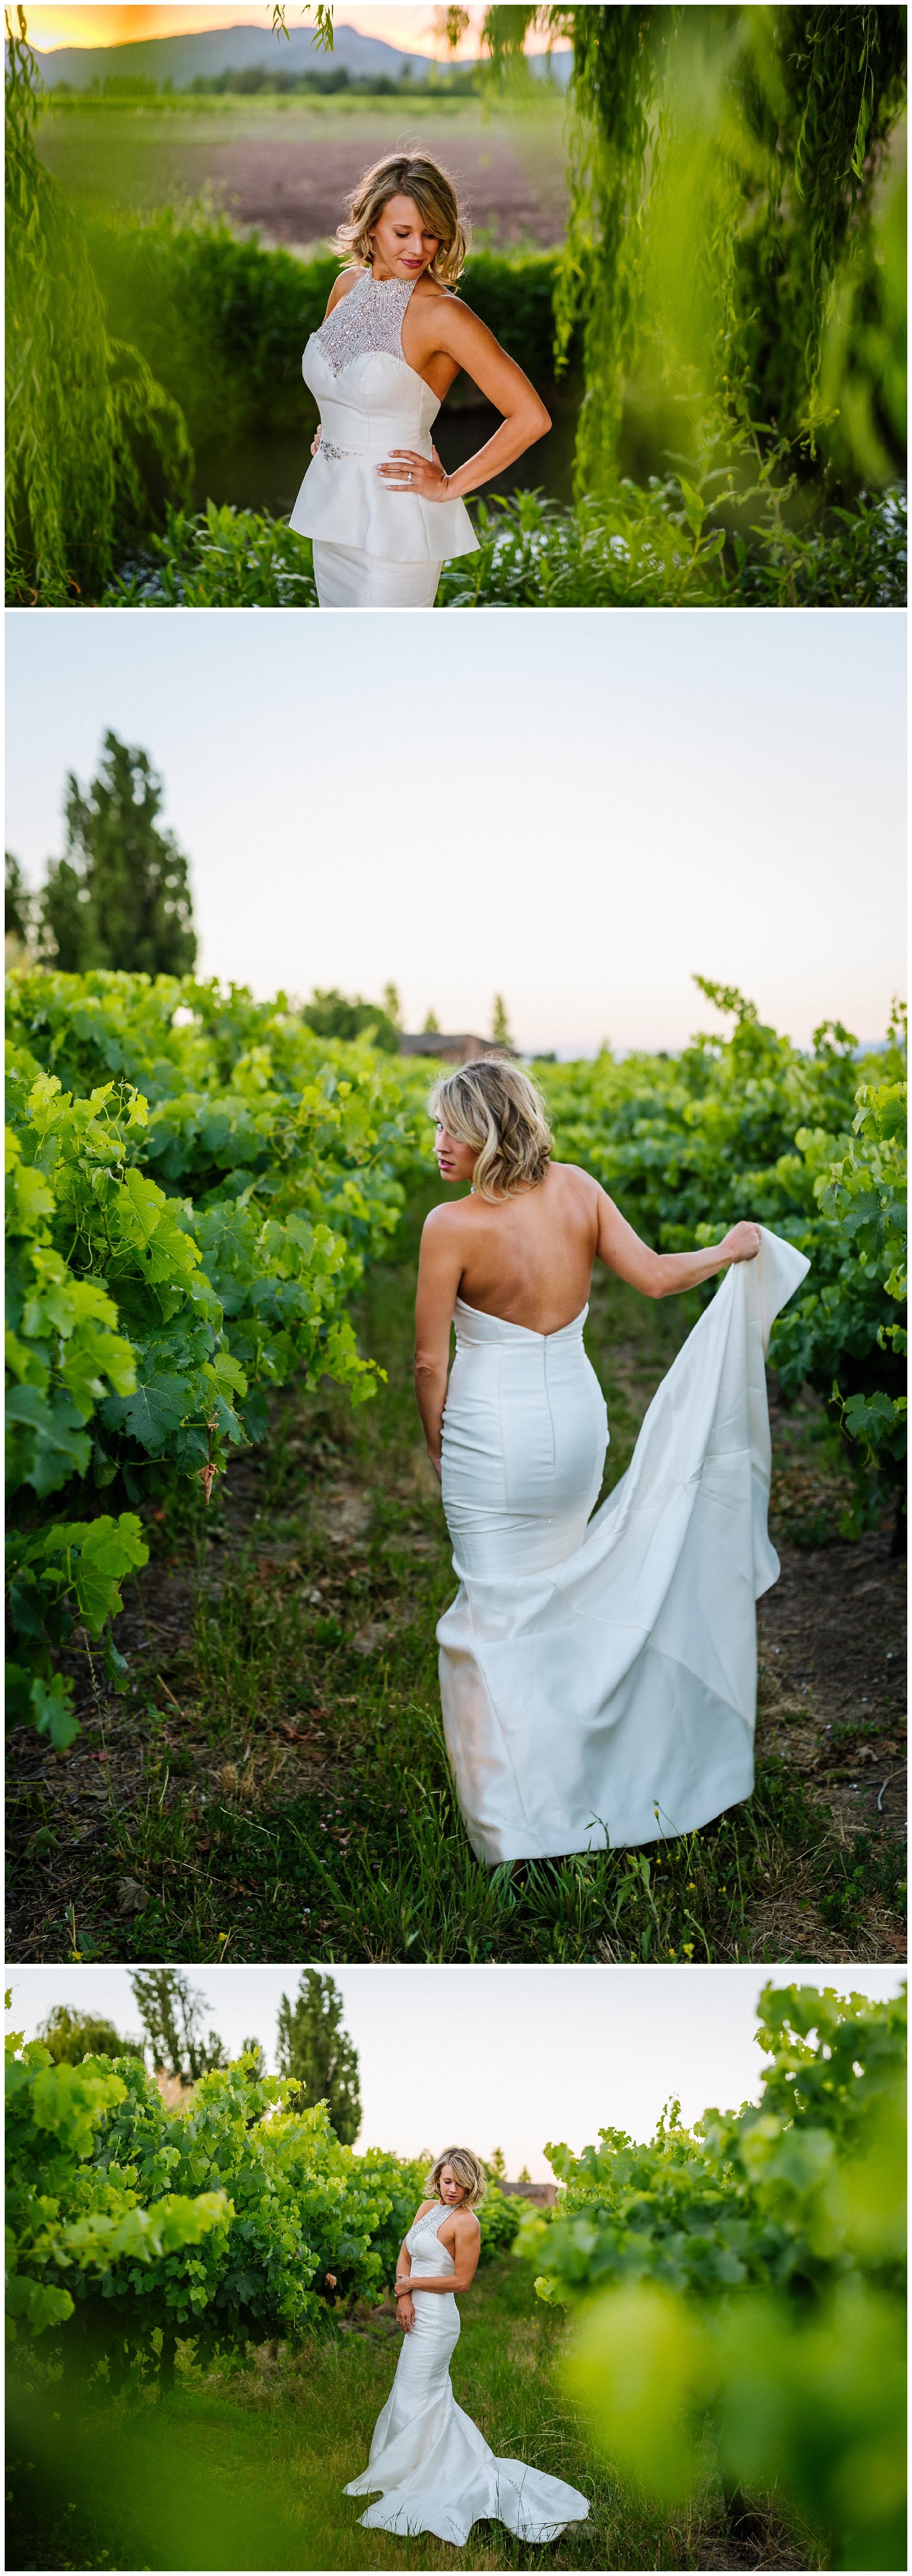 Cheilean-destination-adventure-wedding-florida-patagonia-pucon-santa-cruz-vsco_0147.jpg